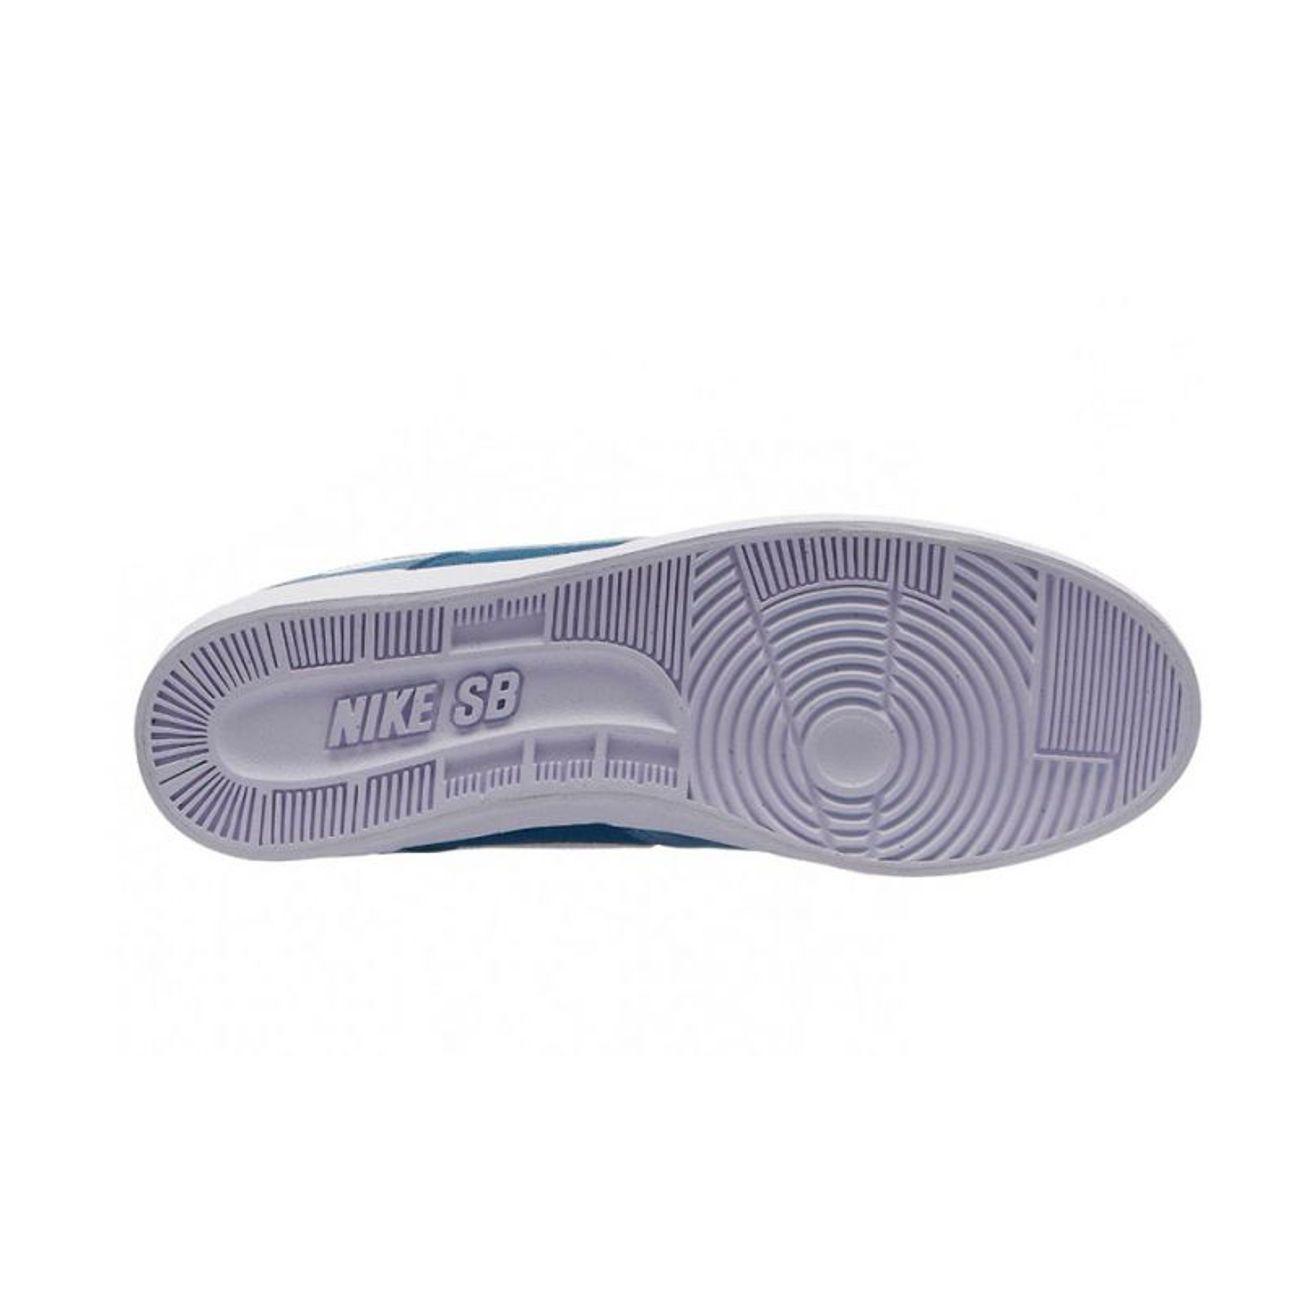 Sb Delta Ni942237 401 Zoom Nike Vulc Azul Adulte Padel Force qSUzpMVG